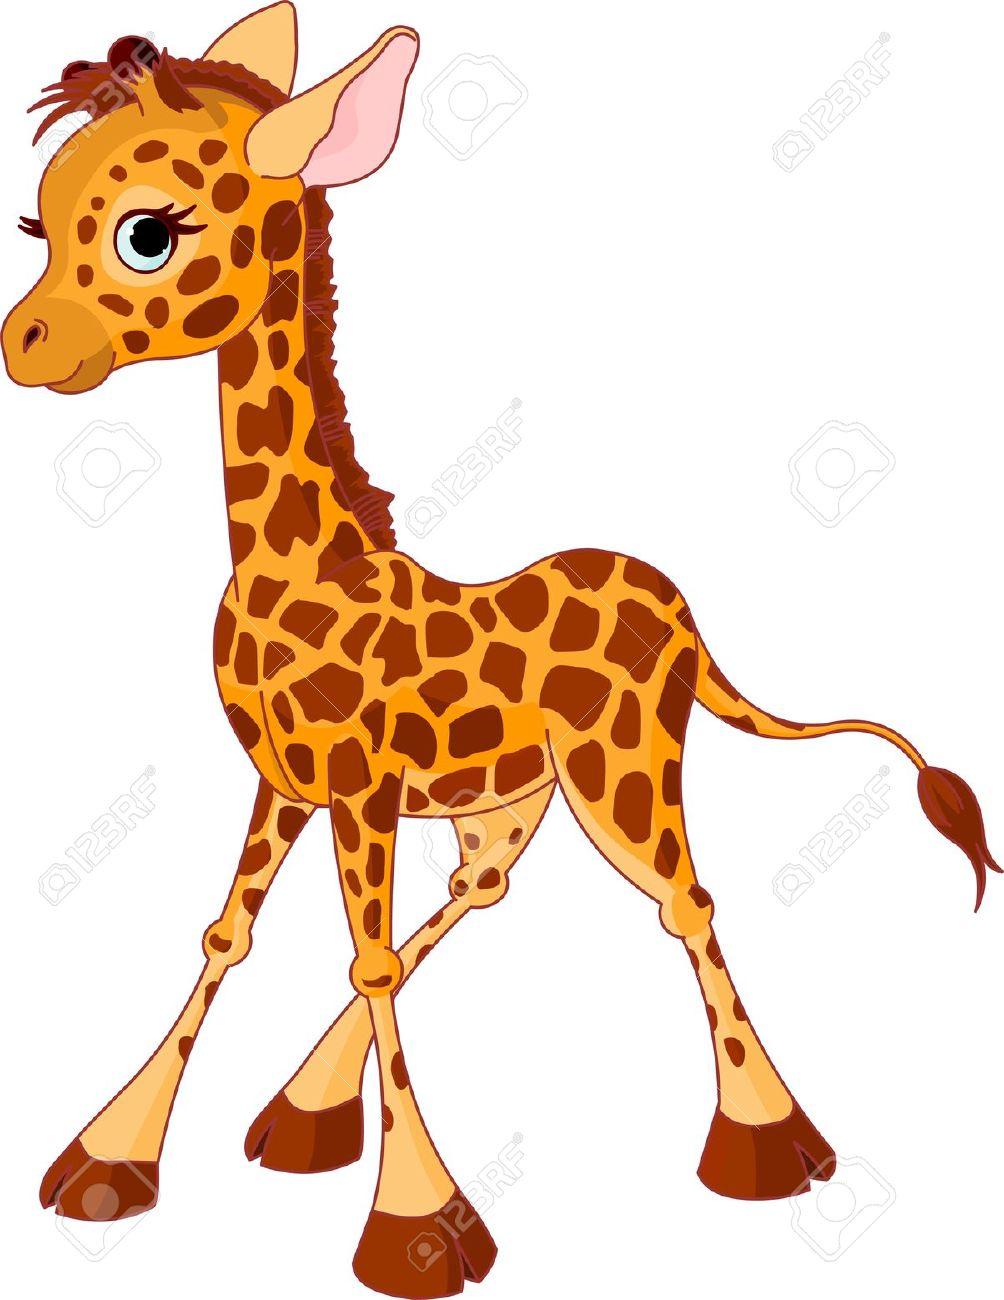 funny giraffe clipart rh askideas com giraffe clip art free giraffe clipart cute